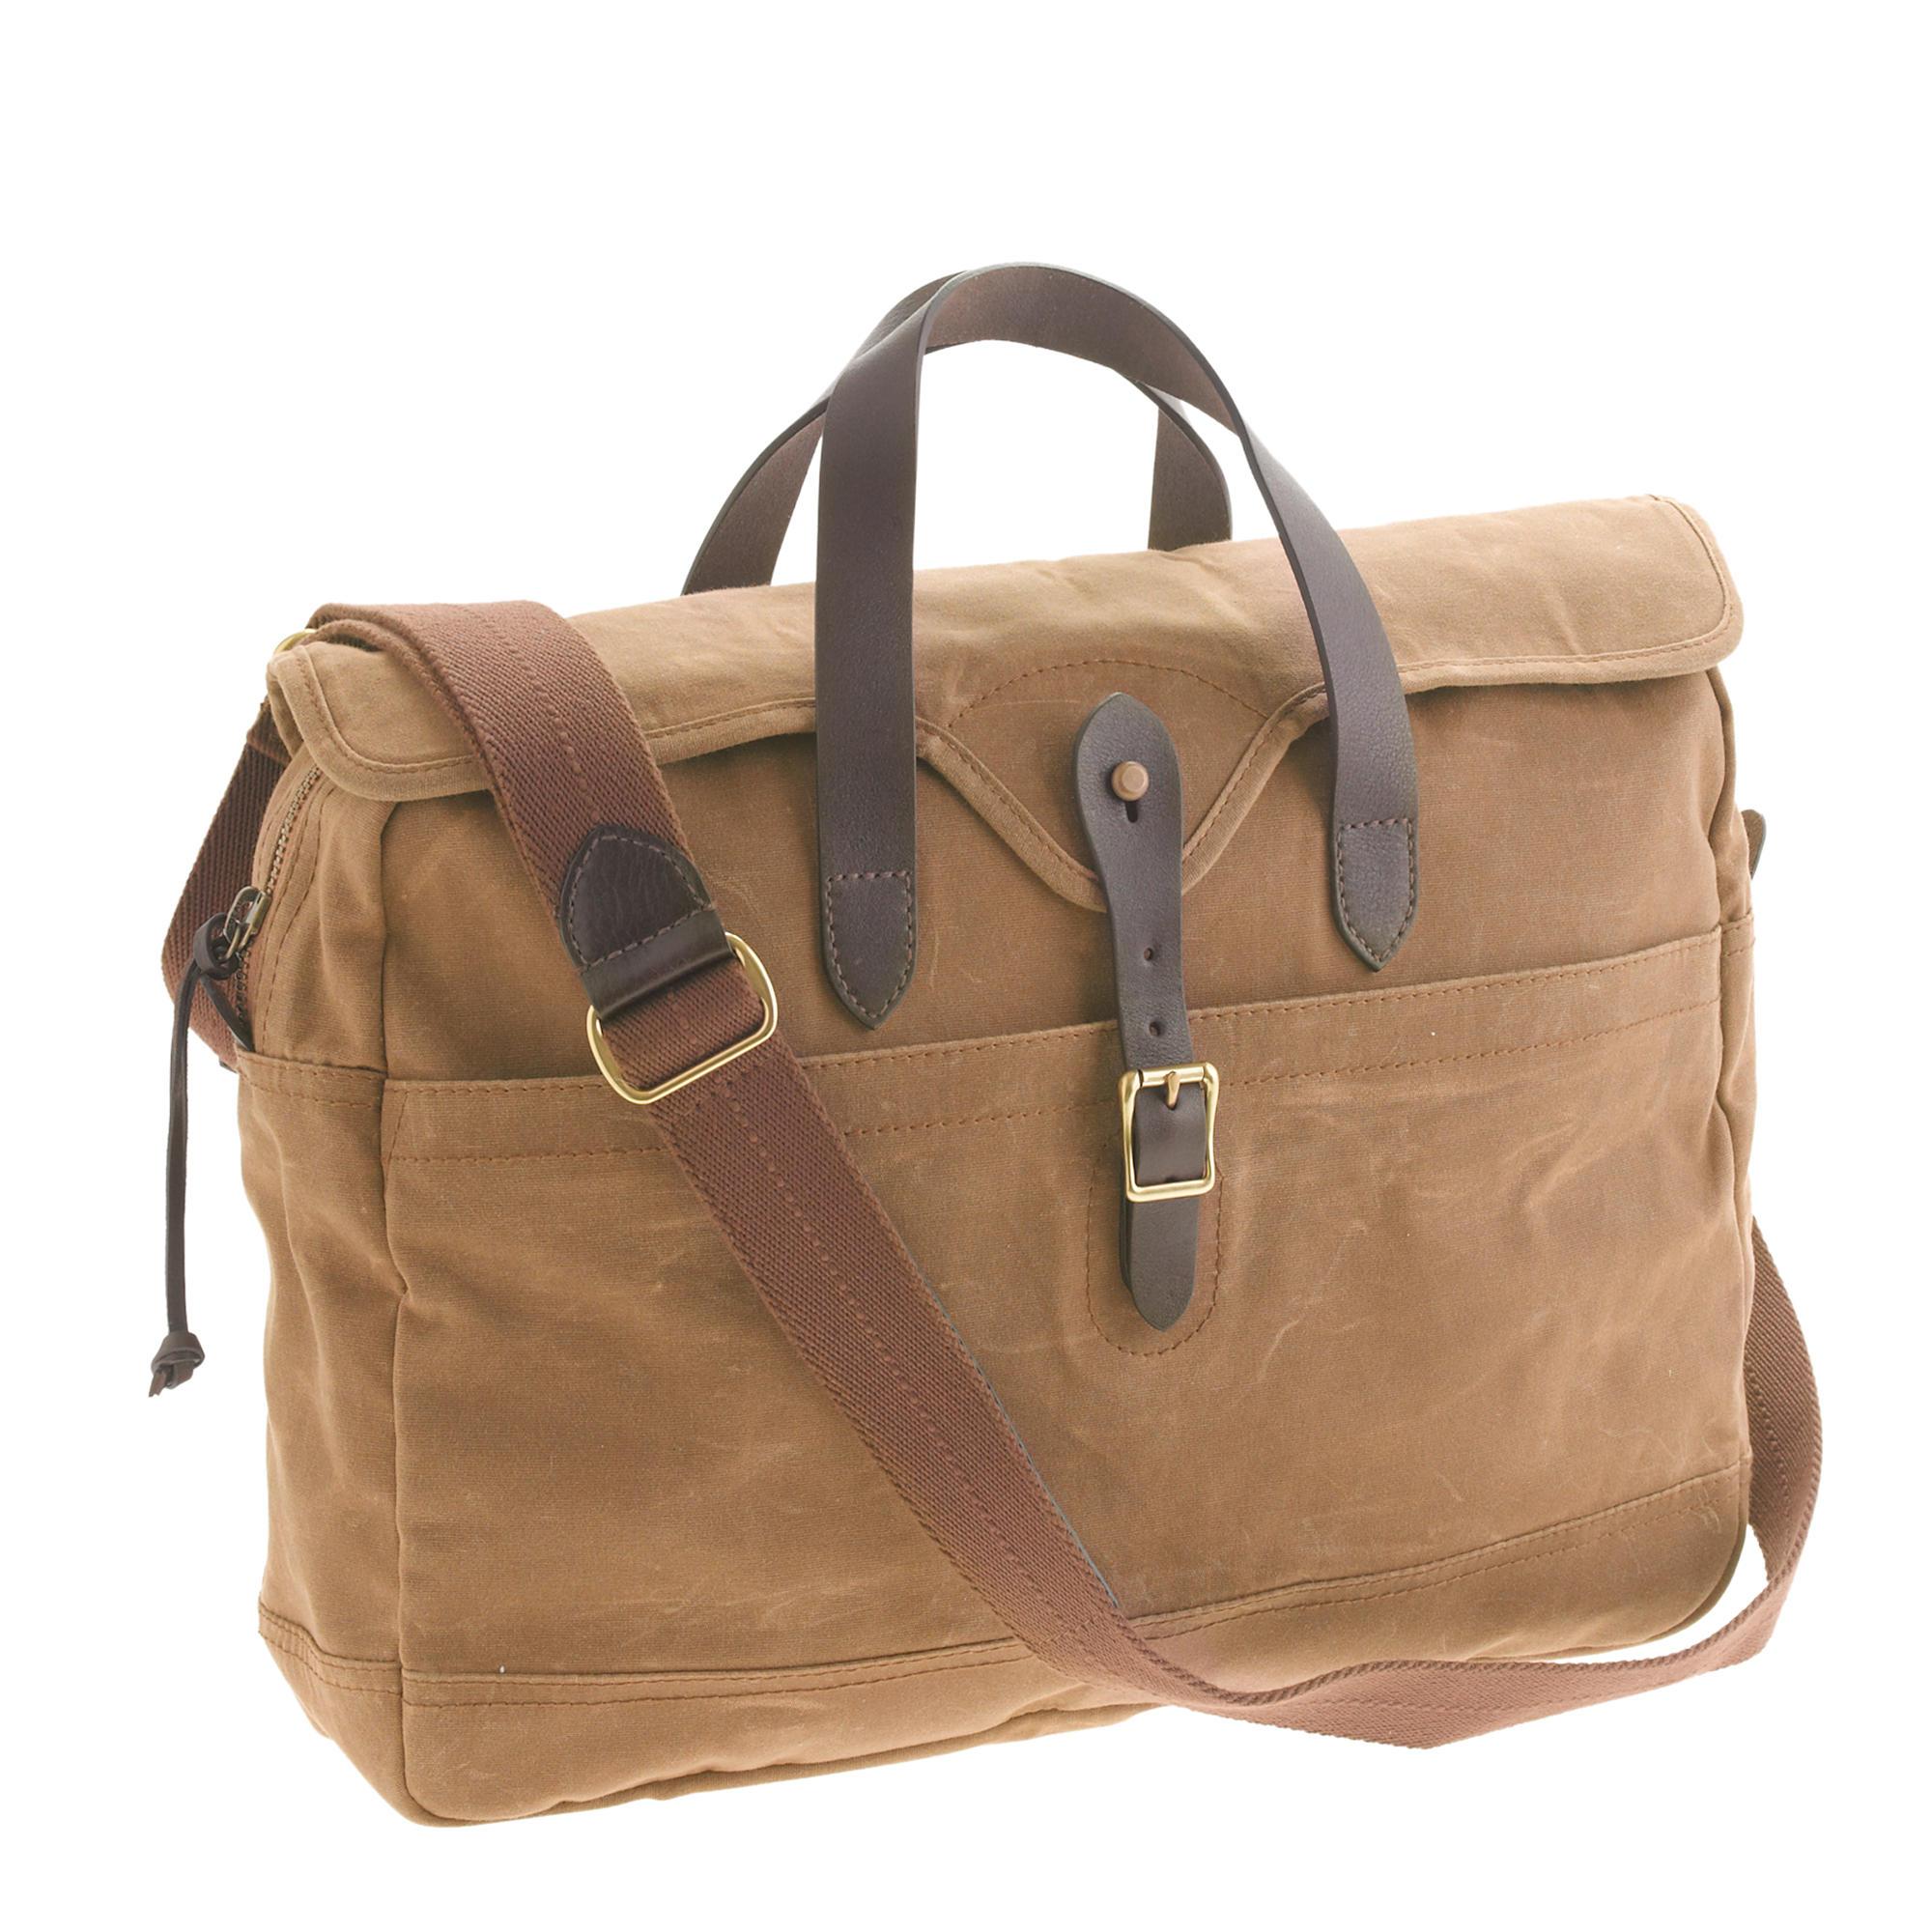 J Crew Abingdon Laptop Bag In Natural For Men Lyst